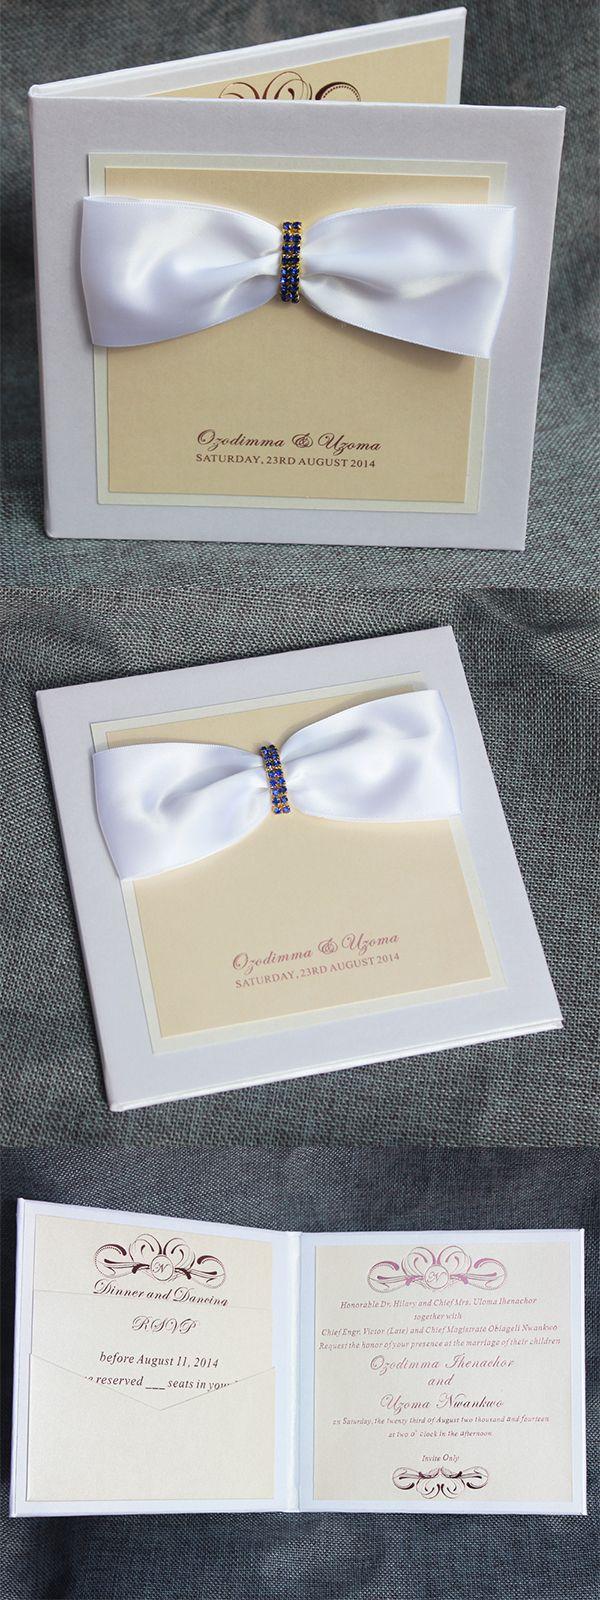 marriage invitation sms on mobile%0A Rhinestone Embellished Hardcover Invitations  Wedding